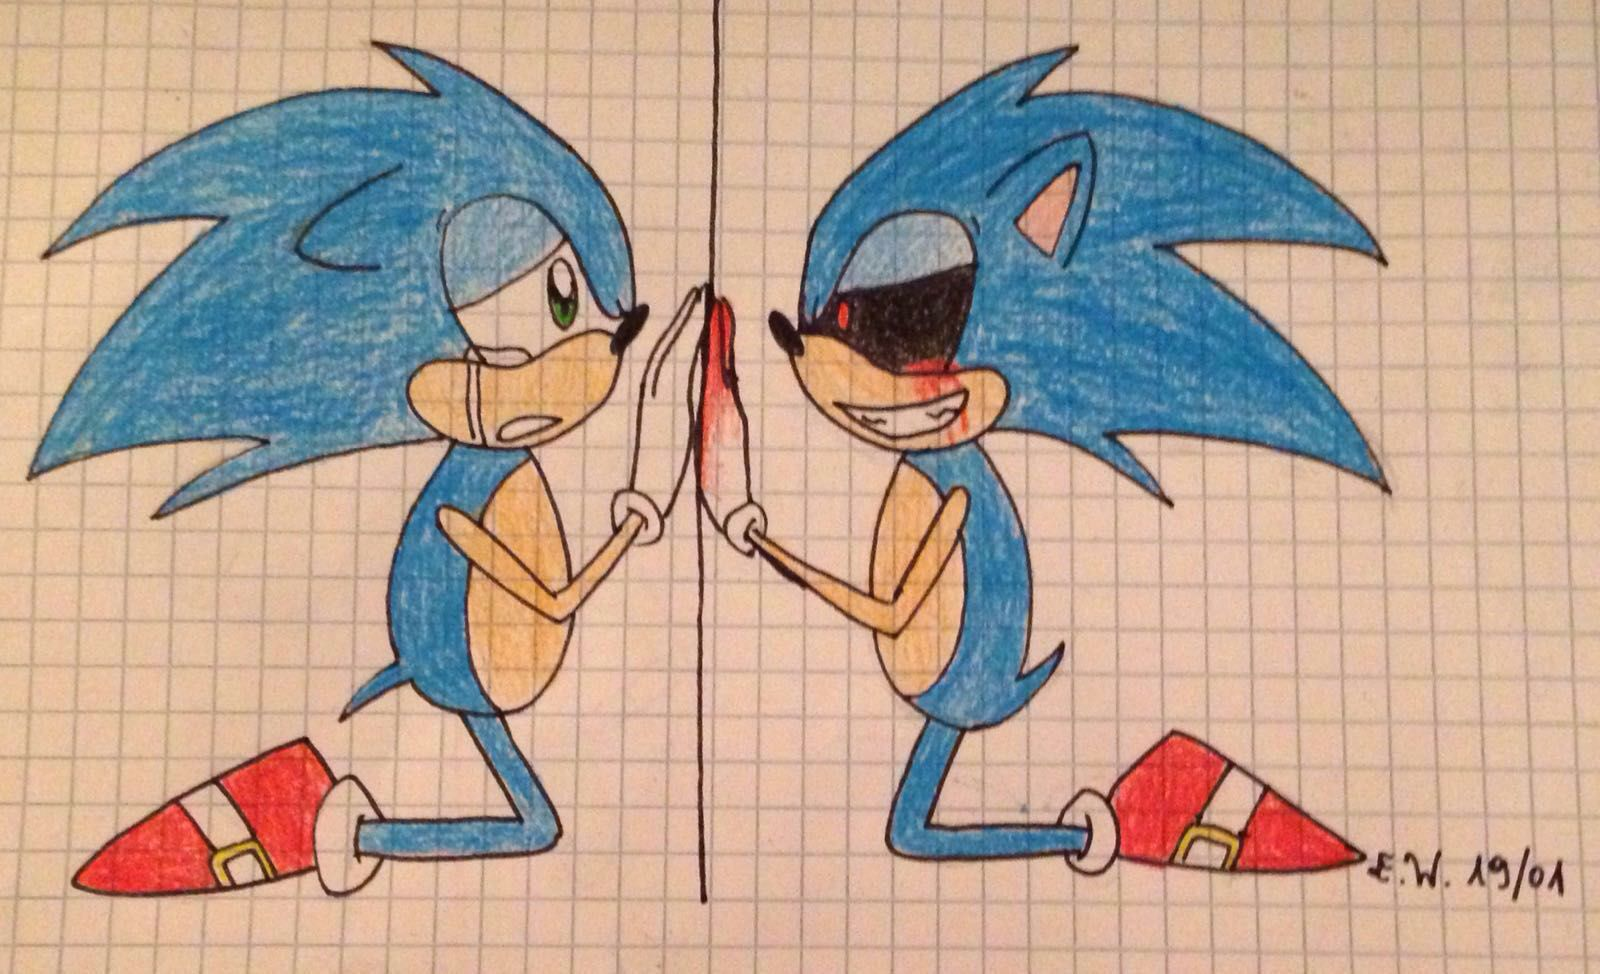 Disegni Disegnosi D Sonic E Sonicexe Wattpad